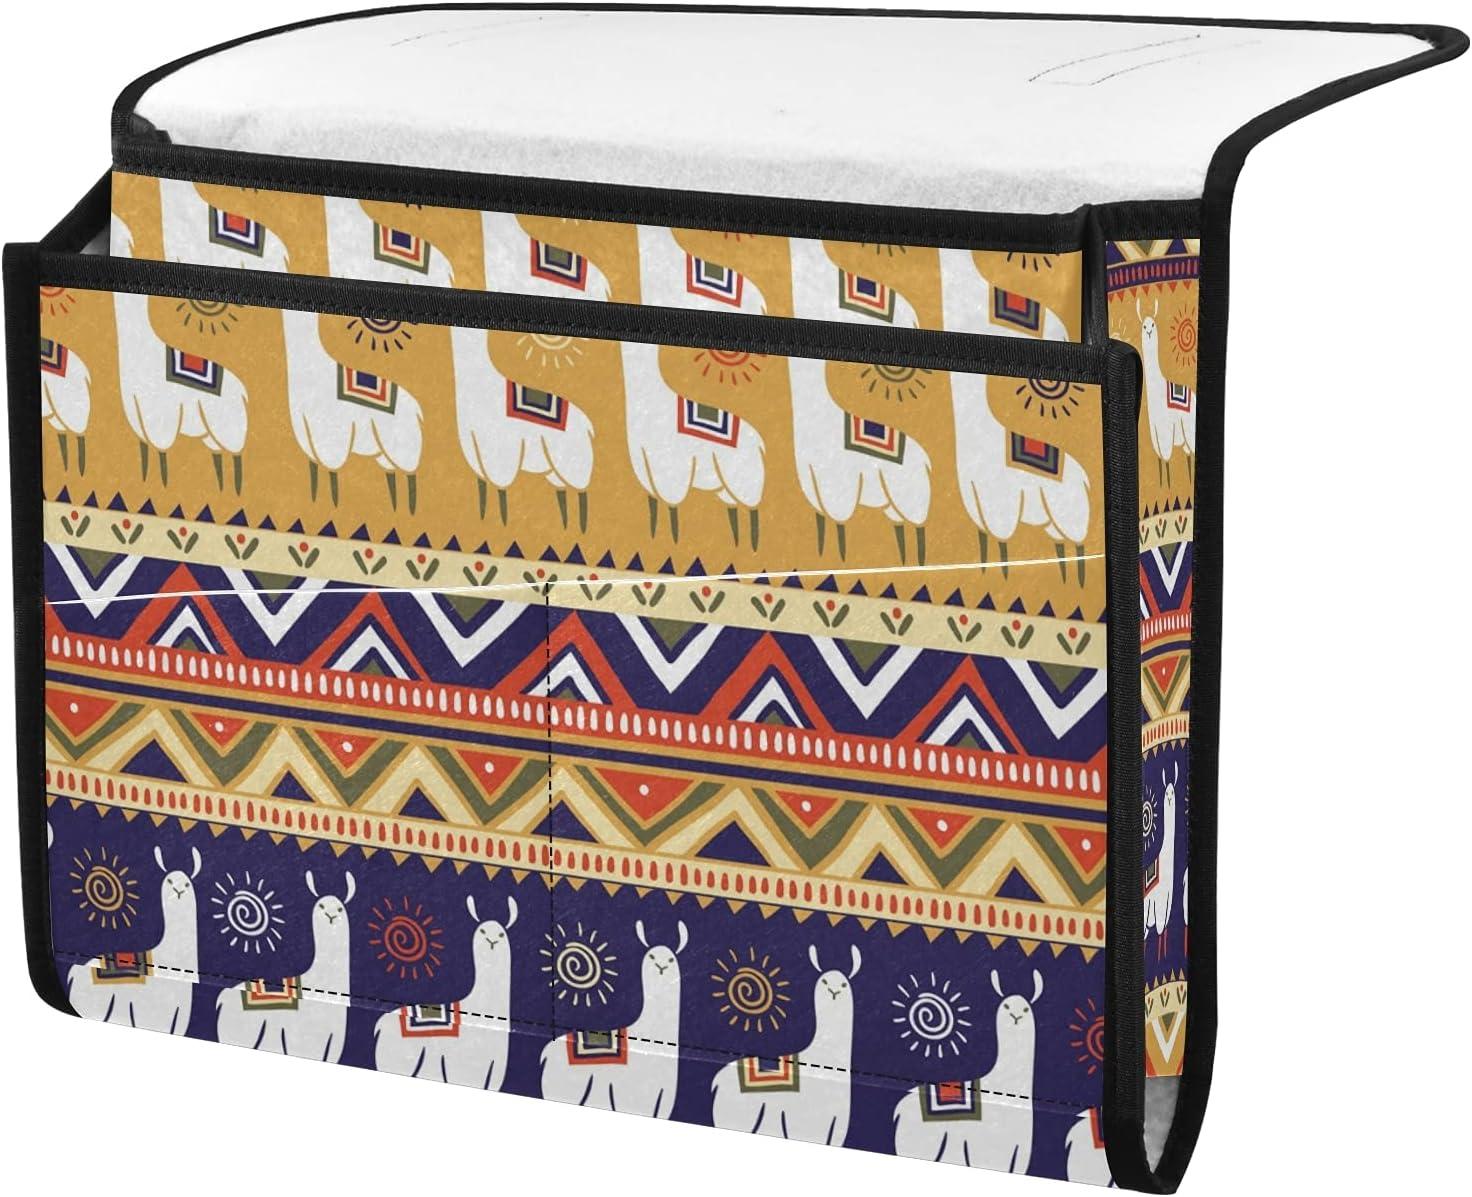 Bedside Caddy Colorado Springs Dallas Mall Mall Storage Organizer Alpaca Indian R Style in